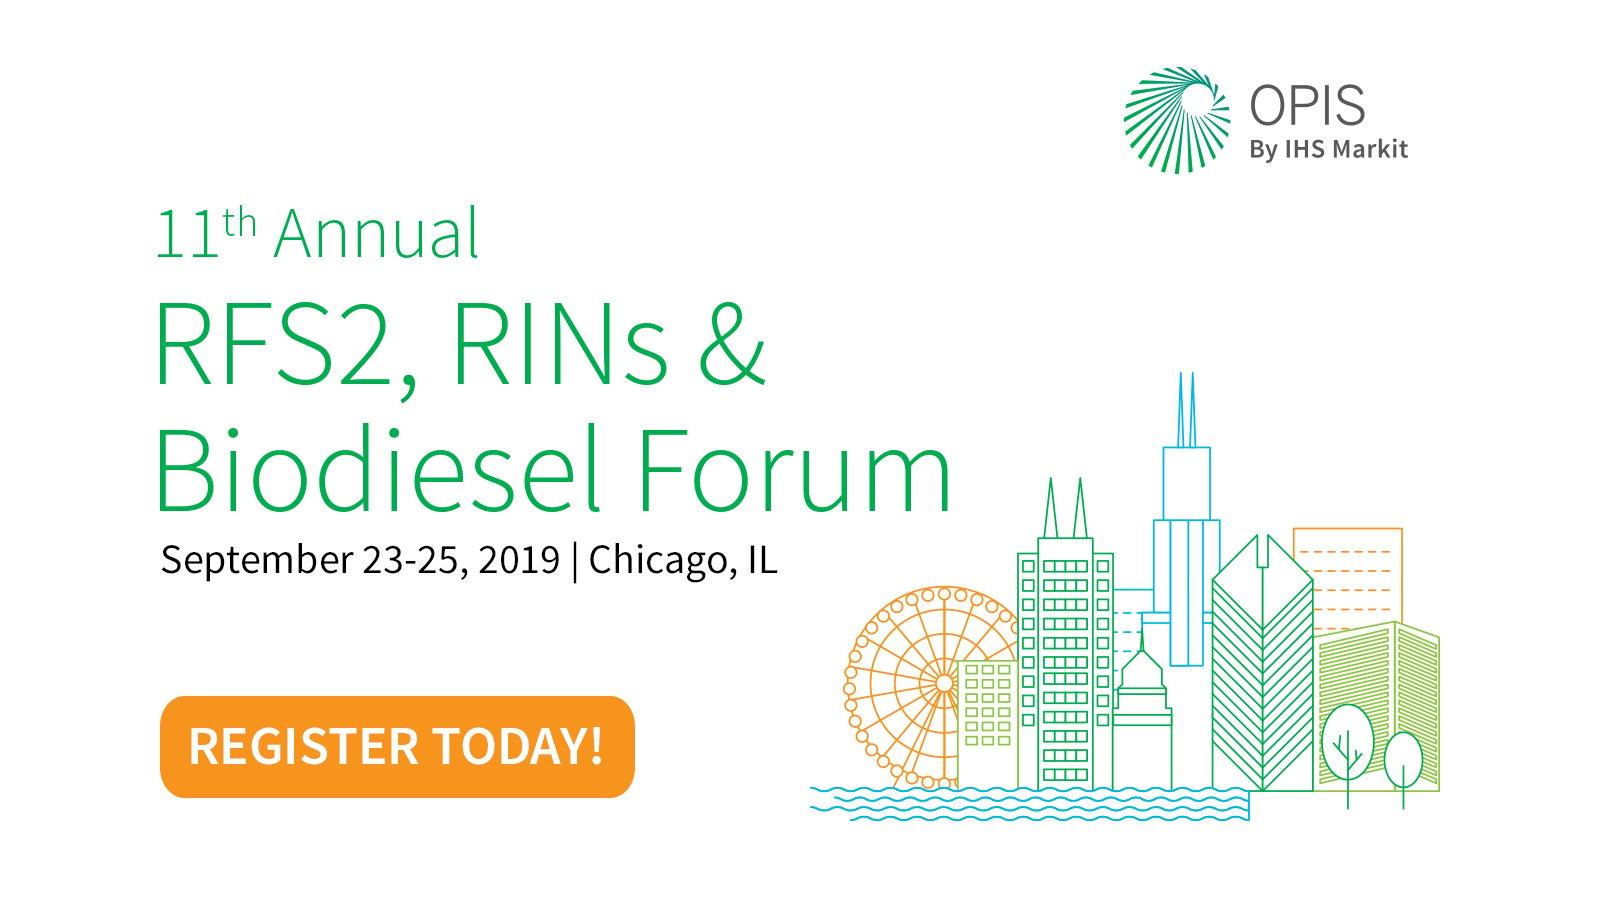 RFS2, RINs & Biodiesel Forum